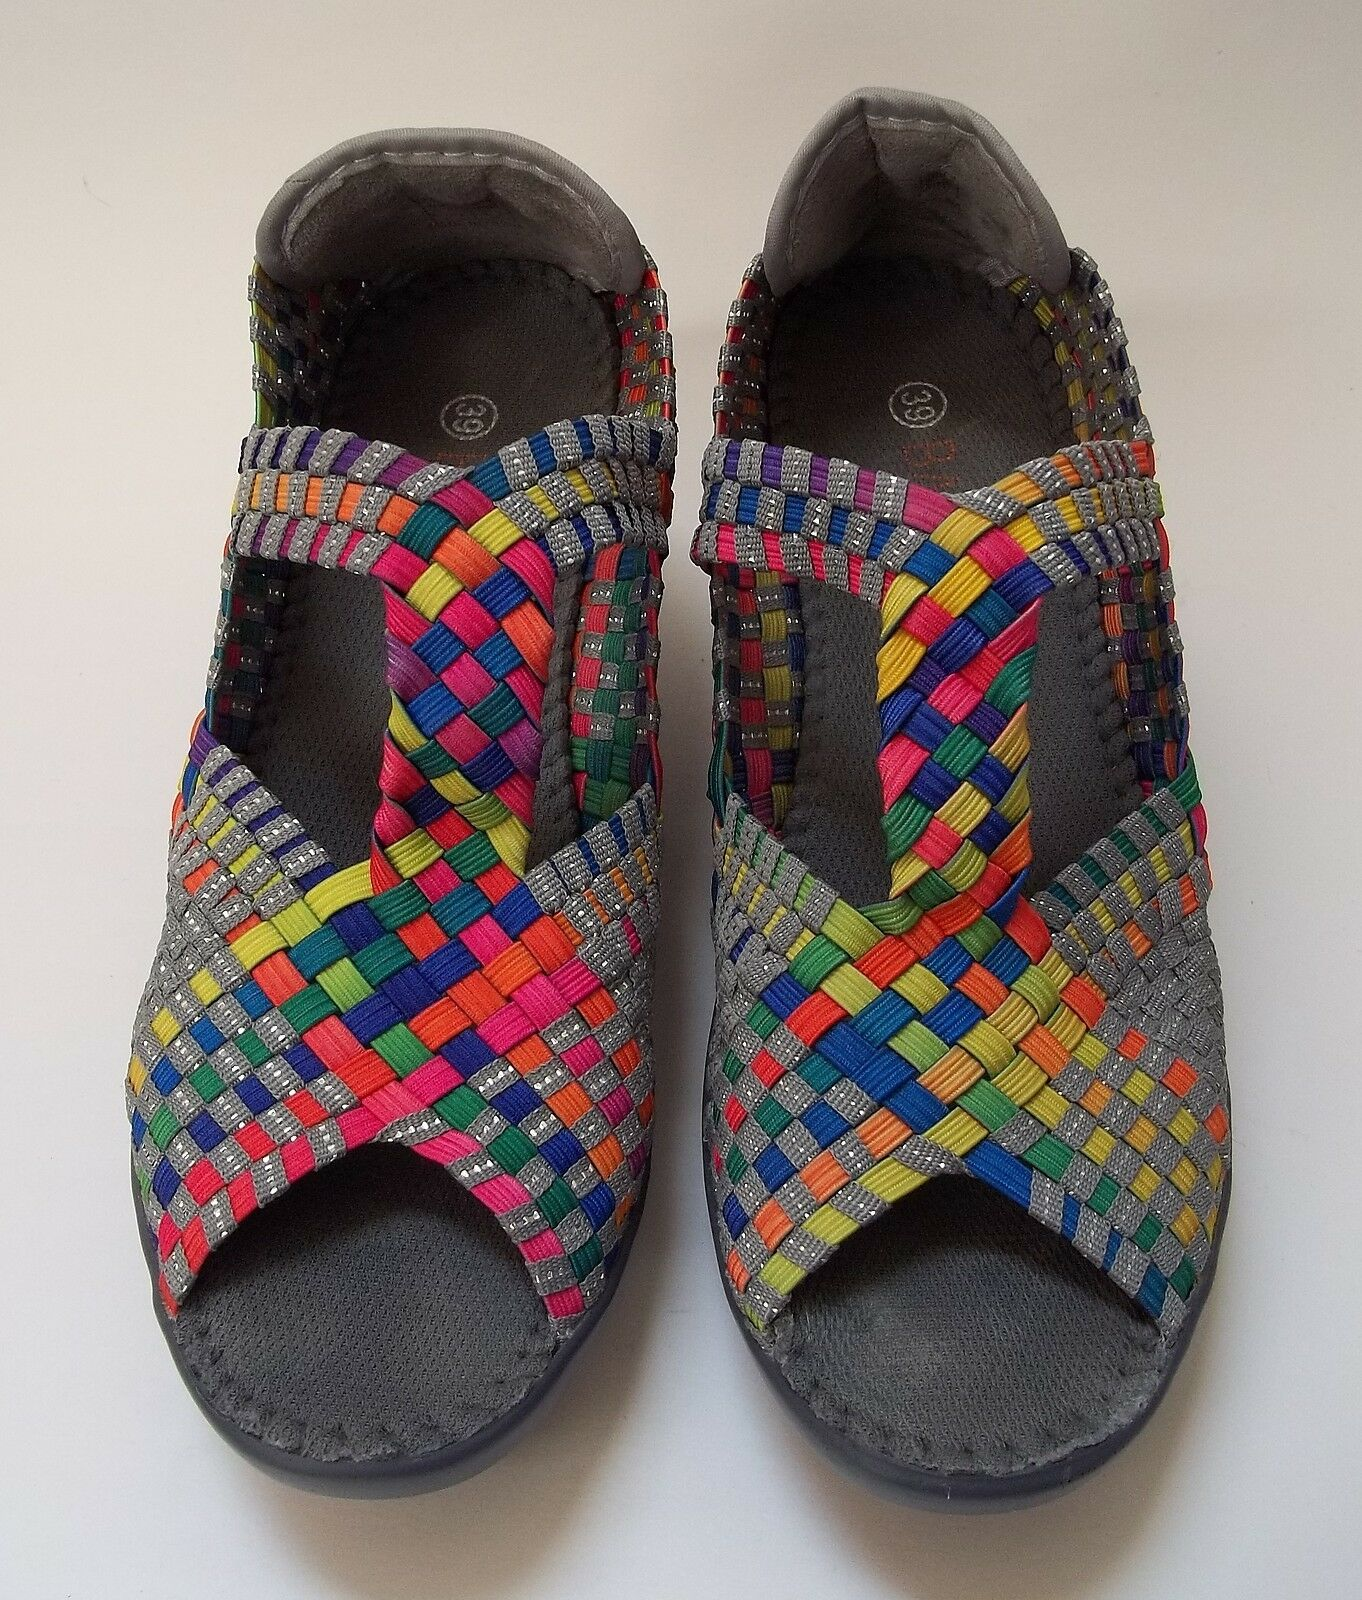 outlet Bernie Mev BM scarpe scarpe scarpe Peep Toe Weave Coloreful Wedge Heels Dimensione 39   US 8.5  fantastica qualità